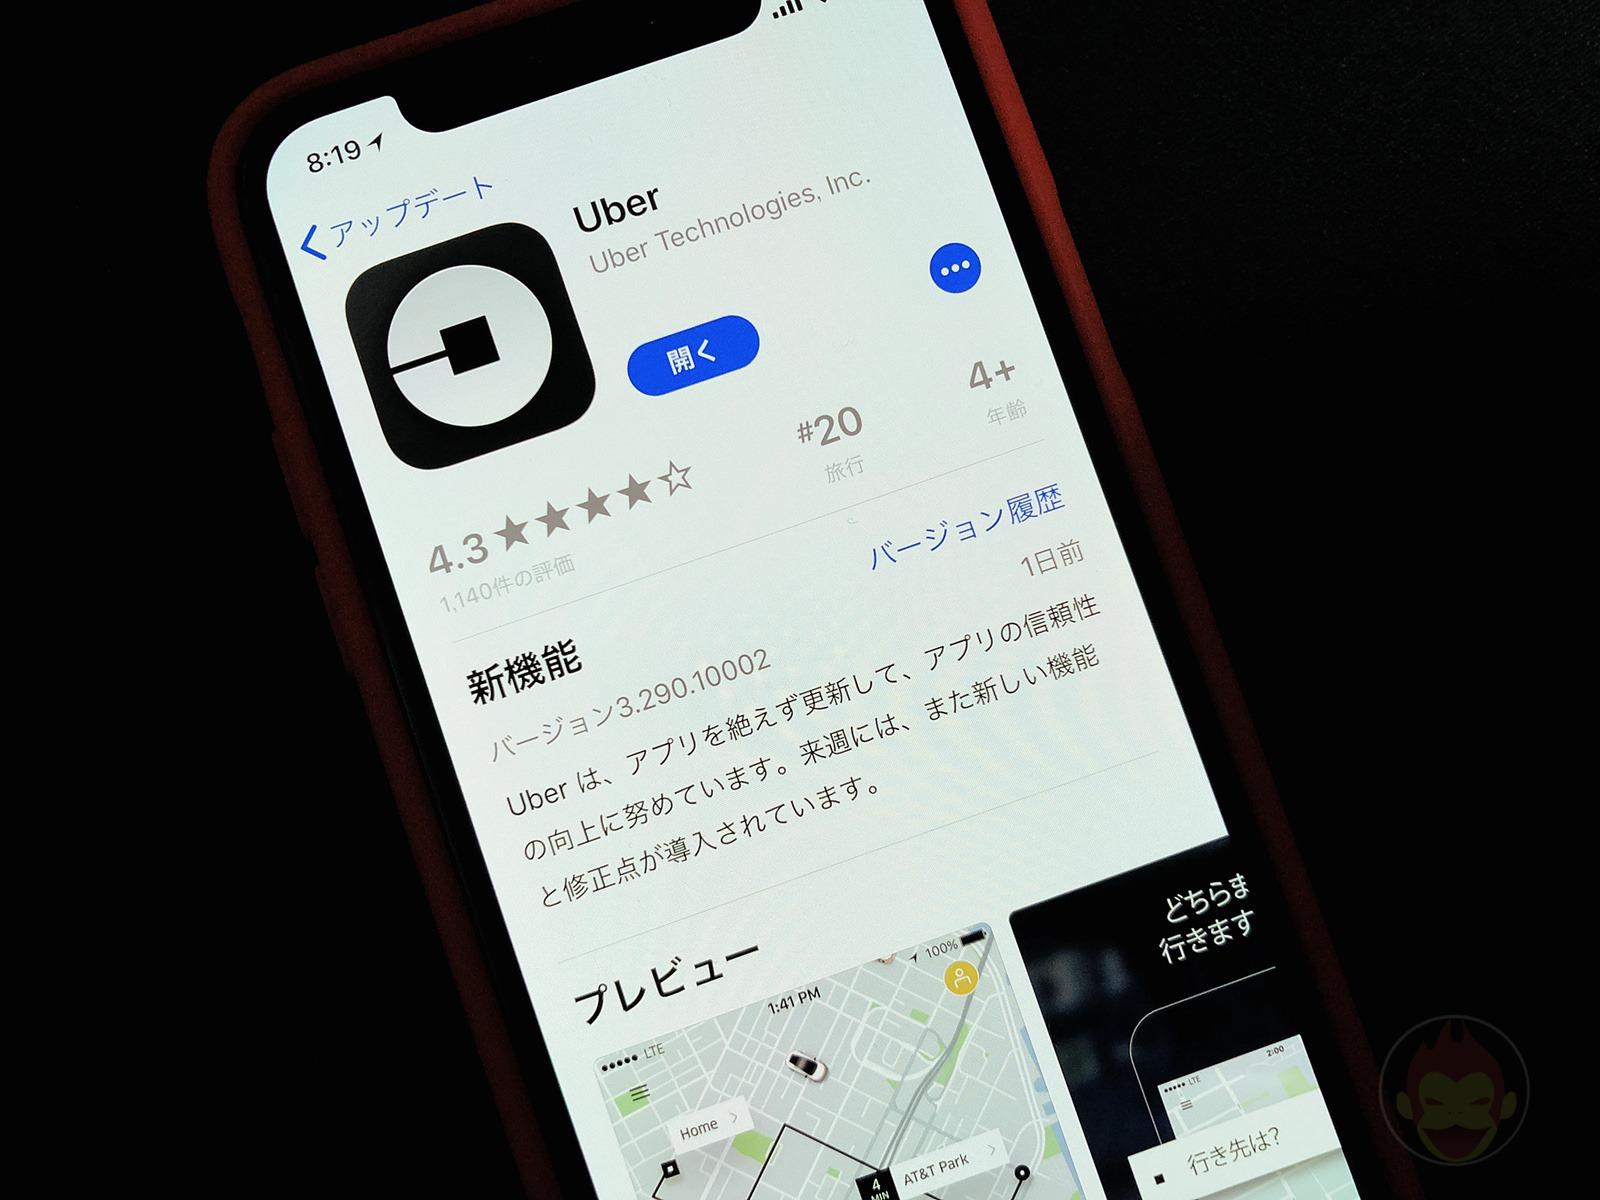 Uber Updates App Store